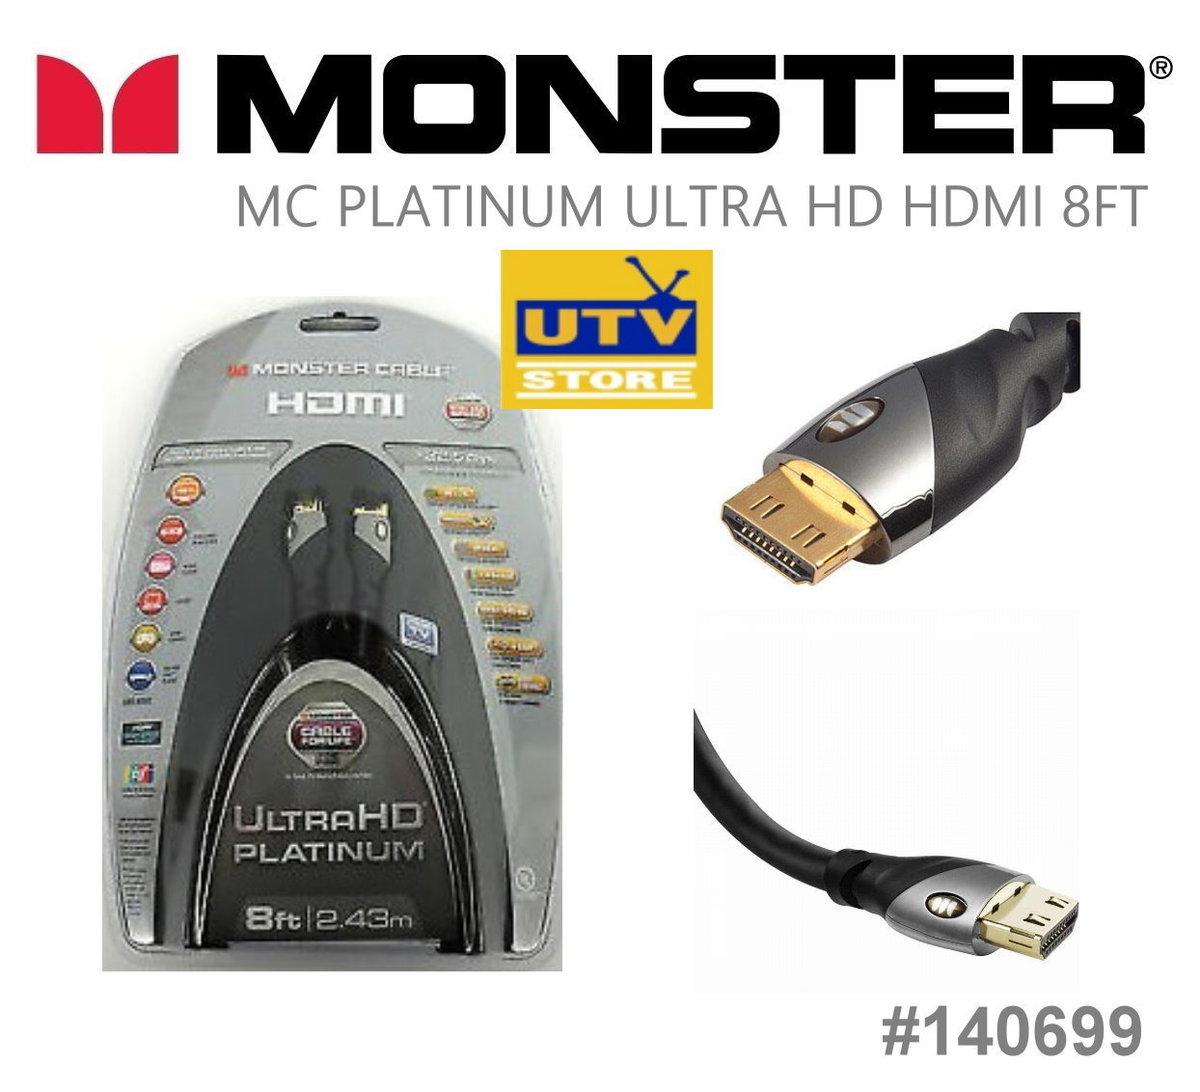 140699 UltraHD Platinum HDMI Cable 2.43m / 8ft